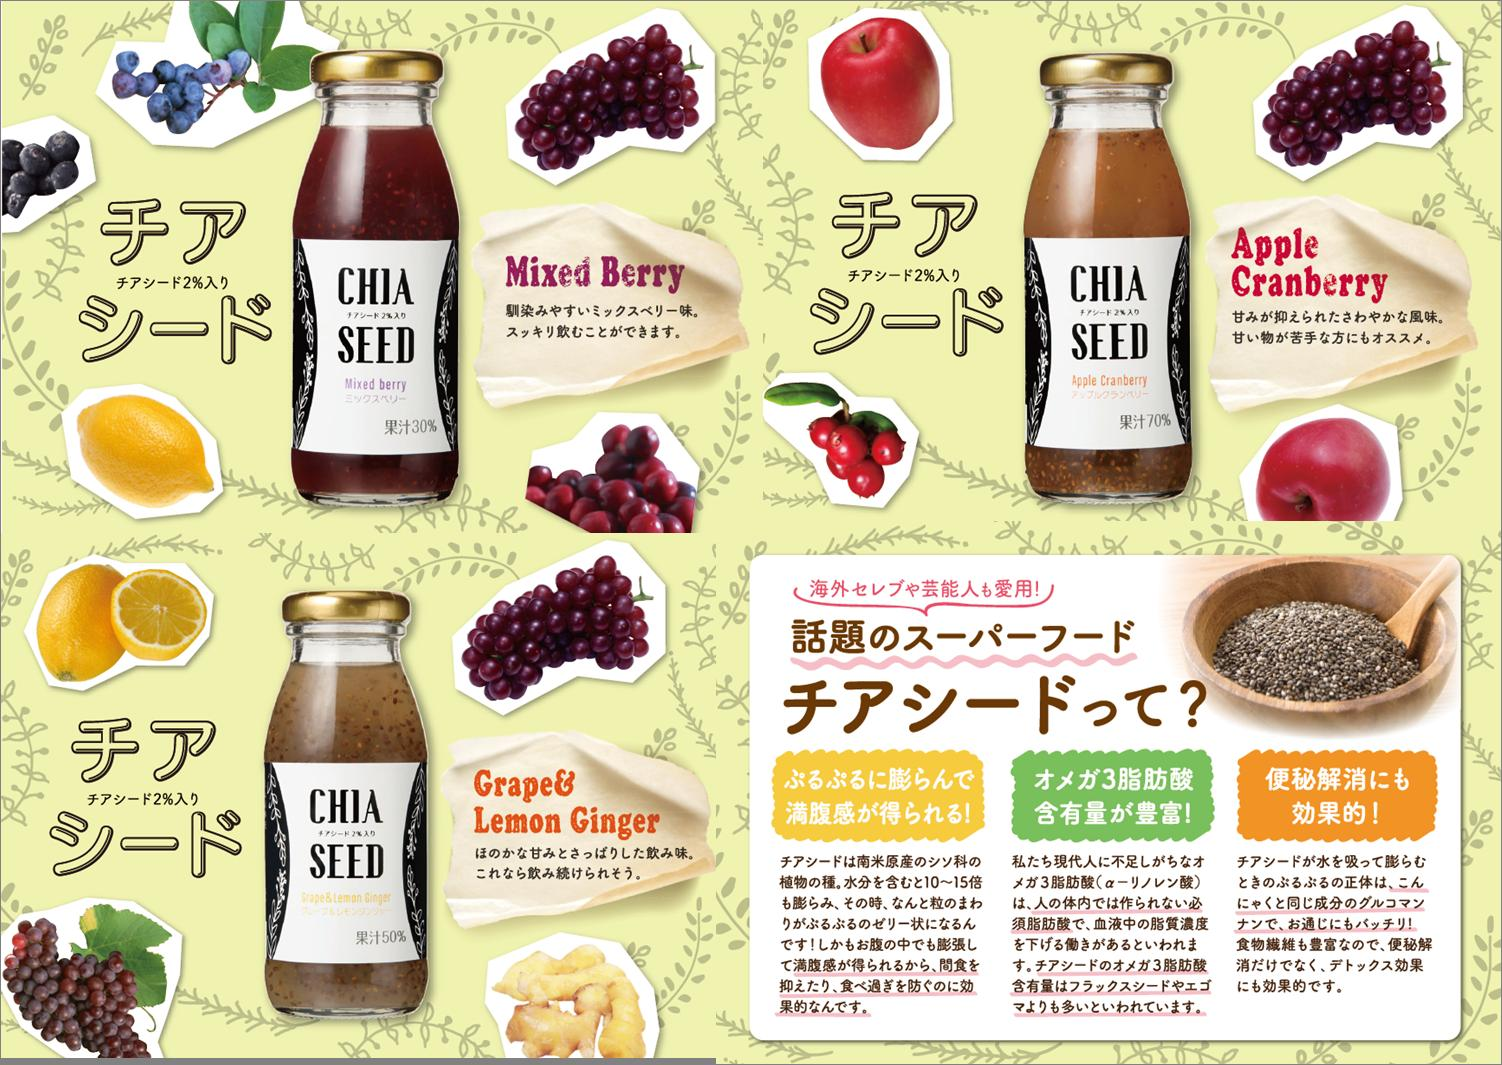 [65A1] 三井食品株式会社